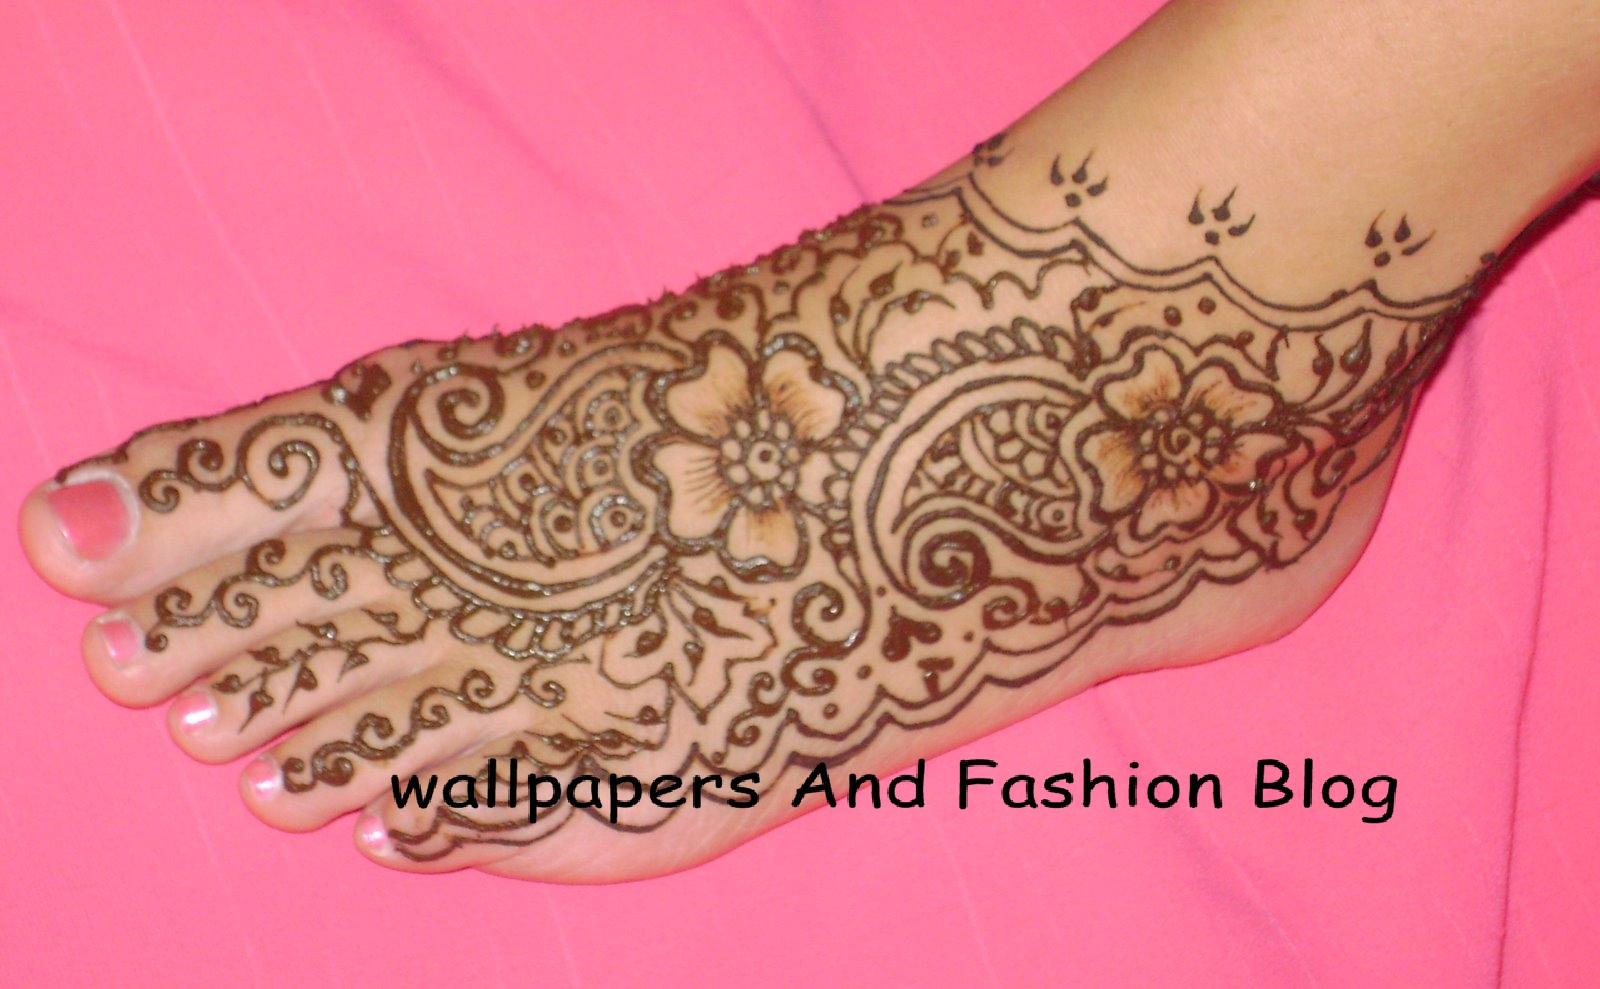 Bridal Foot Mehndi Designs Unforgettable Collection : Bridal foot mehndi designs unforgettable collection